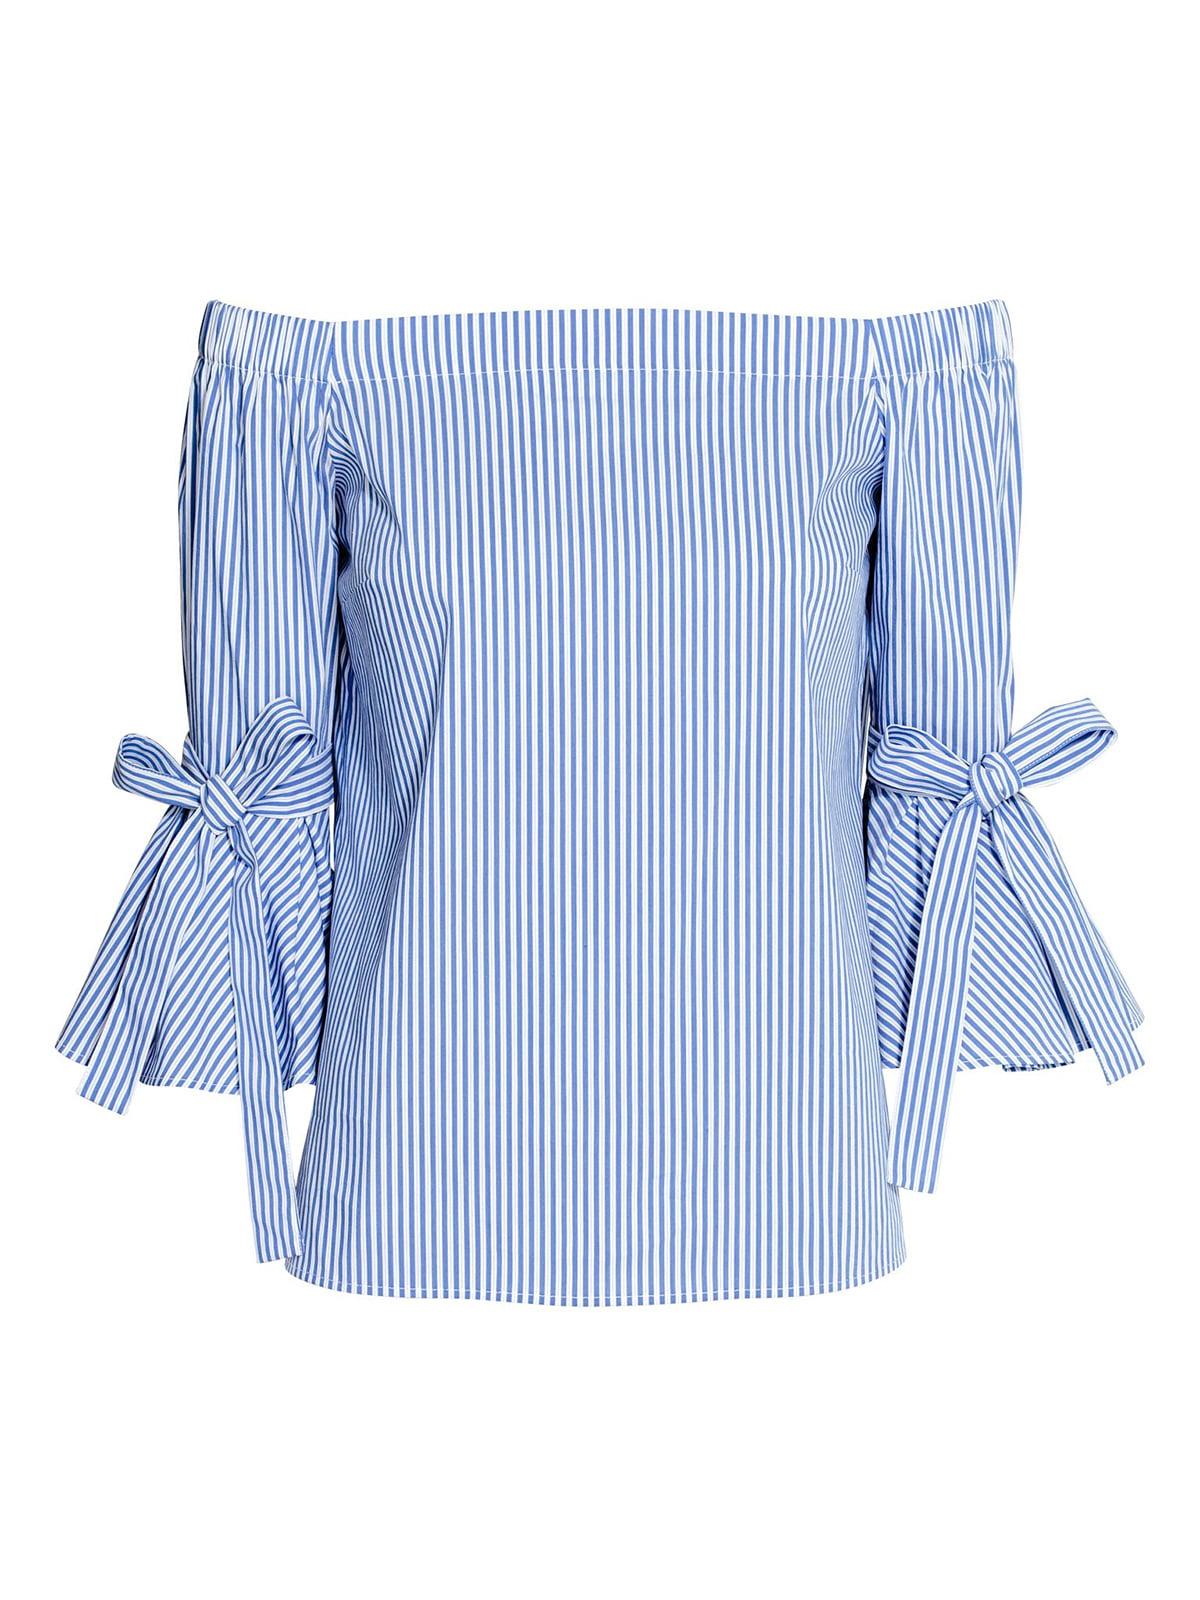 Блуза синя в смужку | 5620015